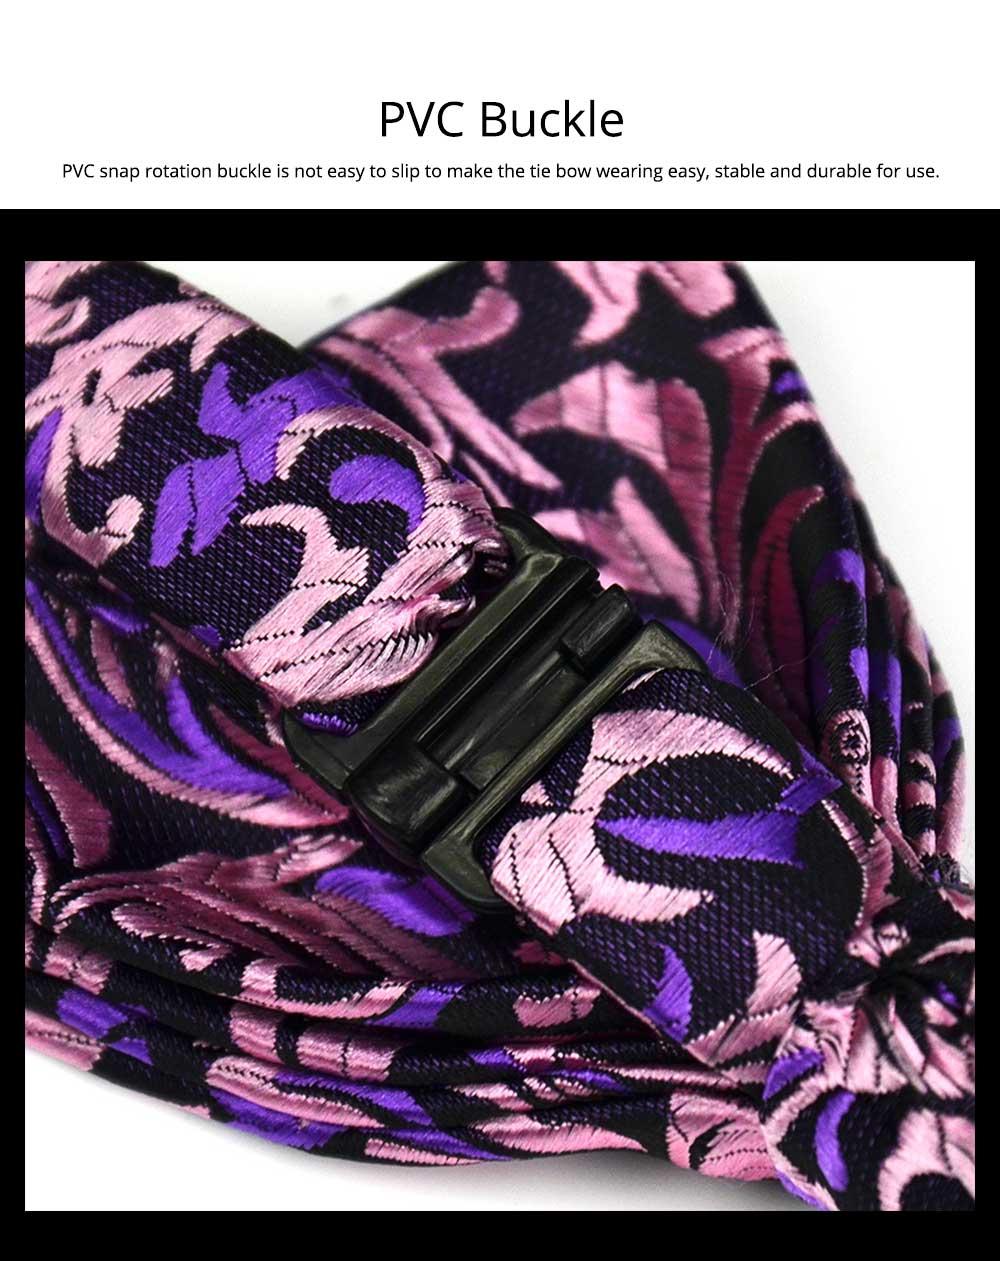 Bow Tie for Wedding Business Suit Fashionable British Style Elviro Tie Bridegroom Groomsman Used Bow Tie Purple Pink Tie European Pattern Design Tie 5